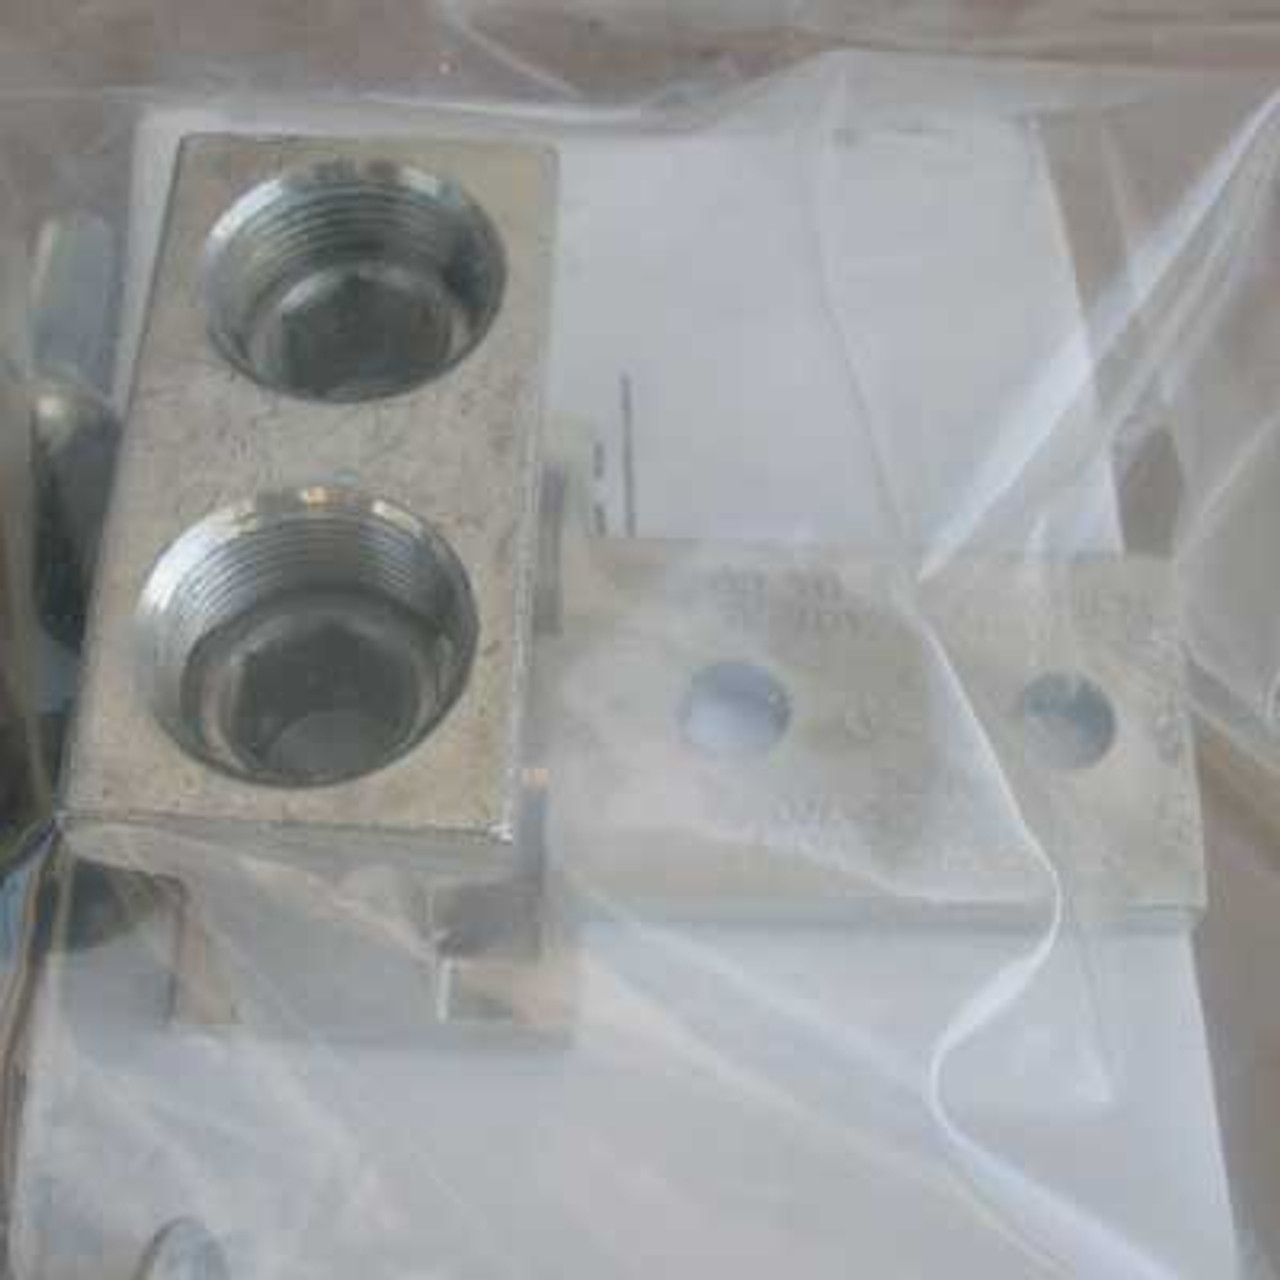 Siemens 2NLK1 200% Neutral Lug Kit - New